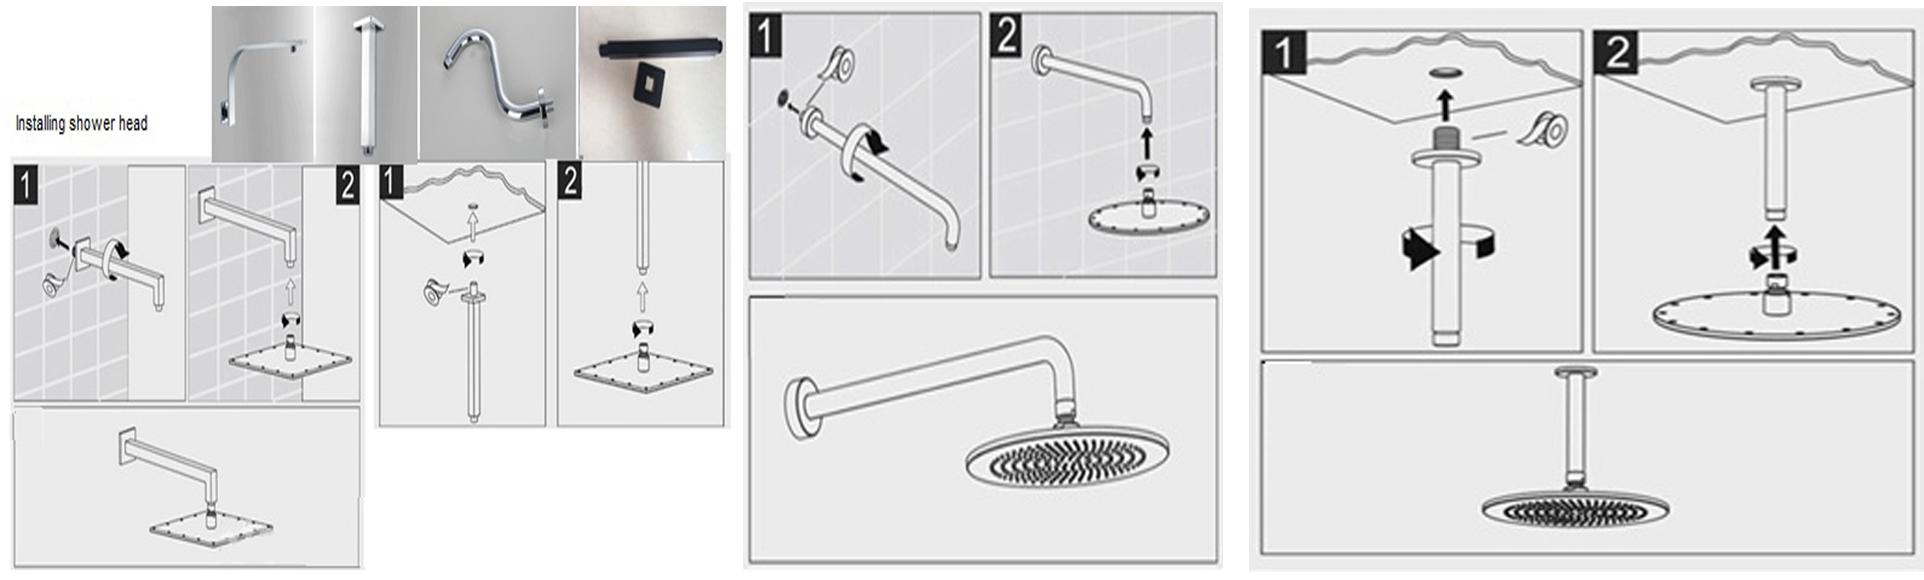 Ceiling Mounted Shower Head Installation Mycoffeepot Org